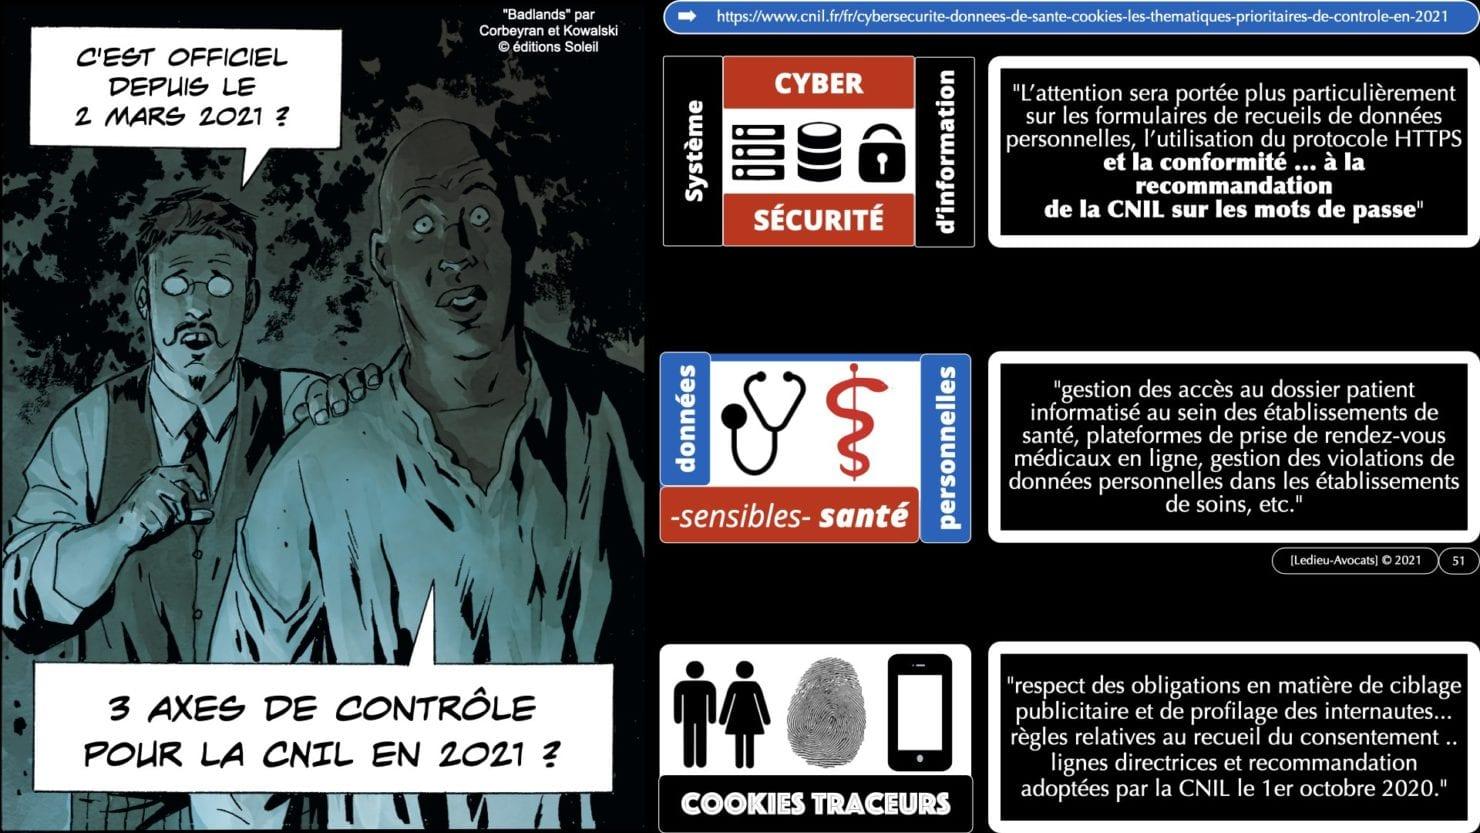 RGPD e-Privacy principes actualité jurisprudence ©Ledieu-Avocats 25-06-2021.051